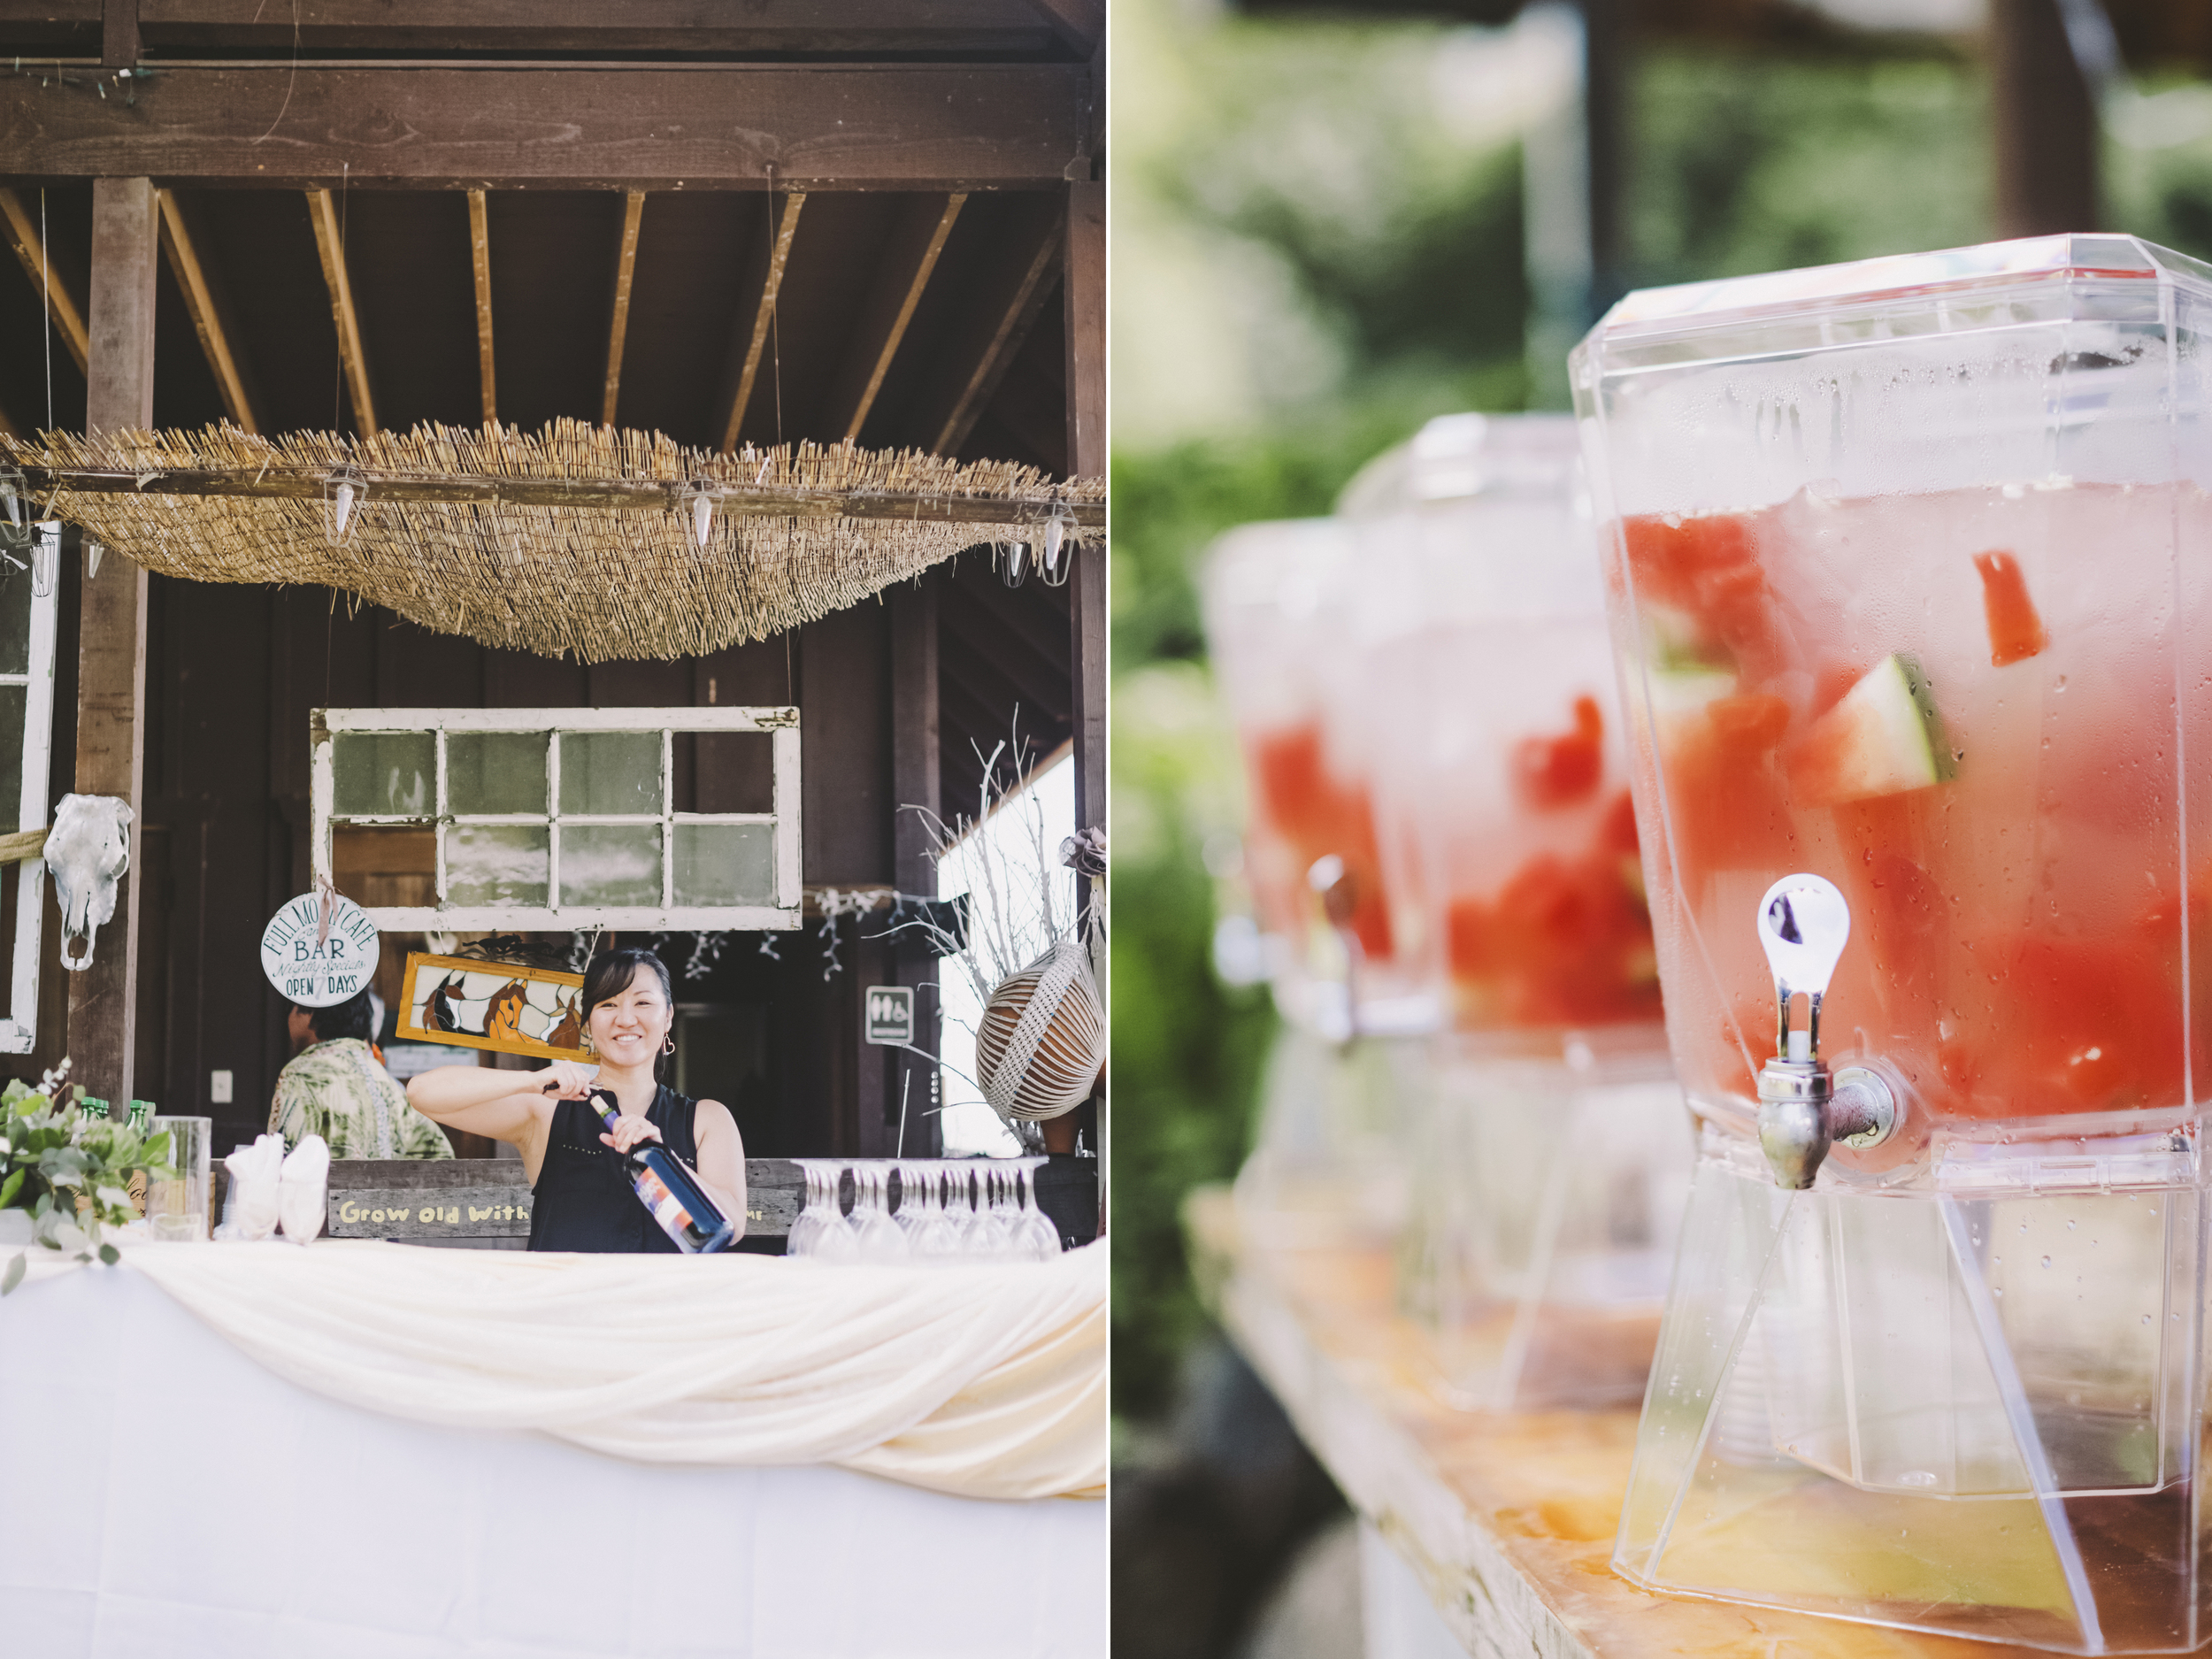 angie-diaz-photography-oahu-hawaii-wedding-tradewinds-ranch-96.jpg